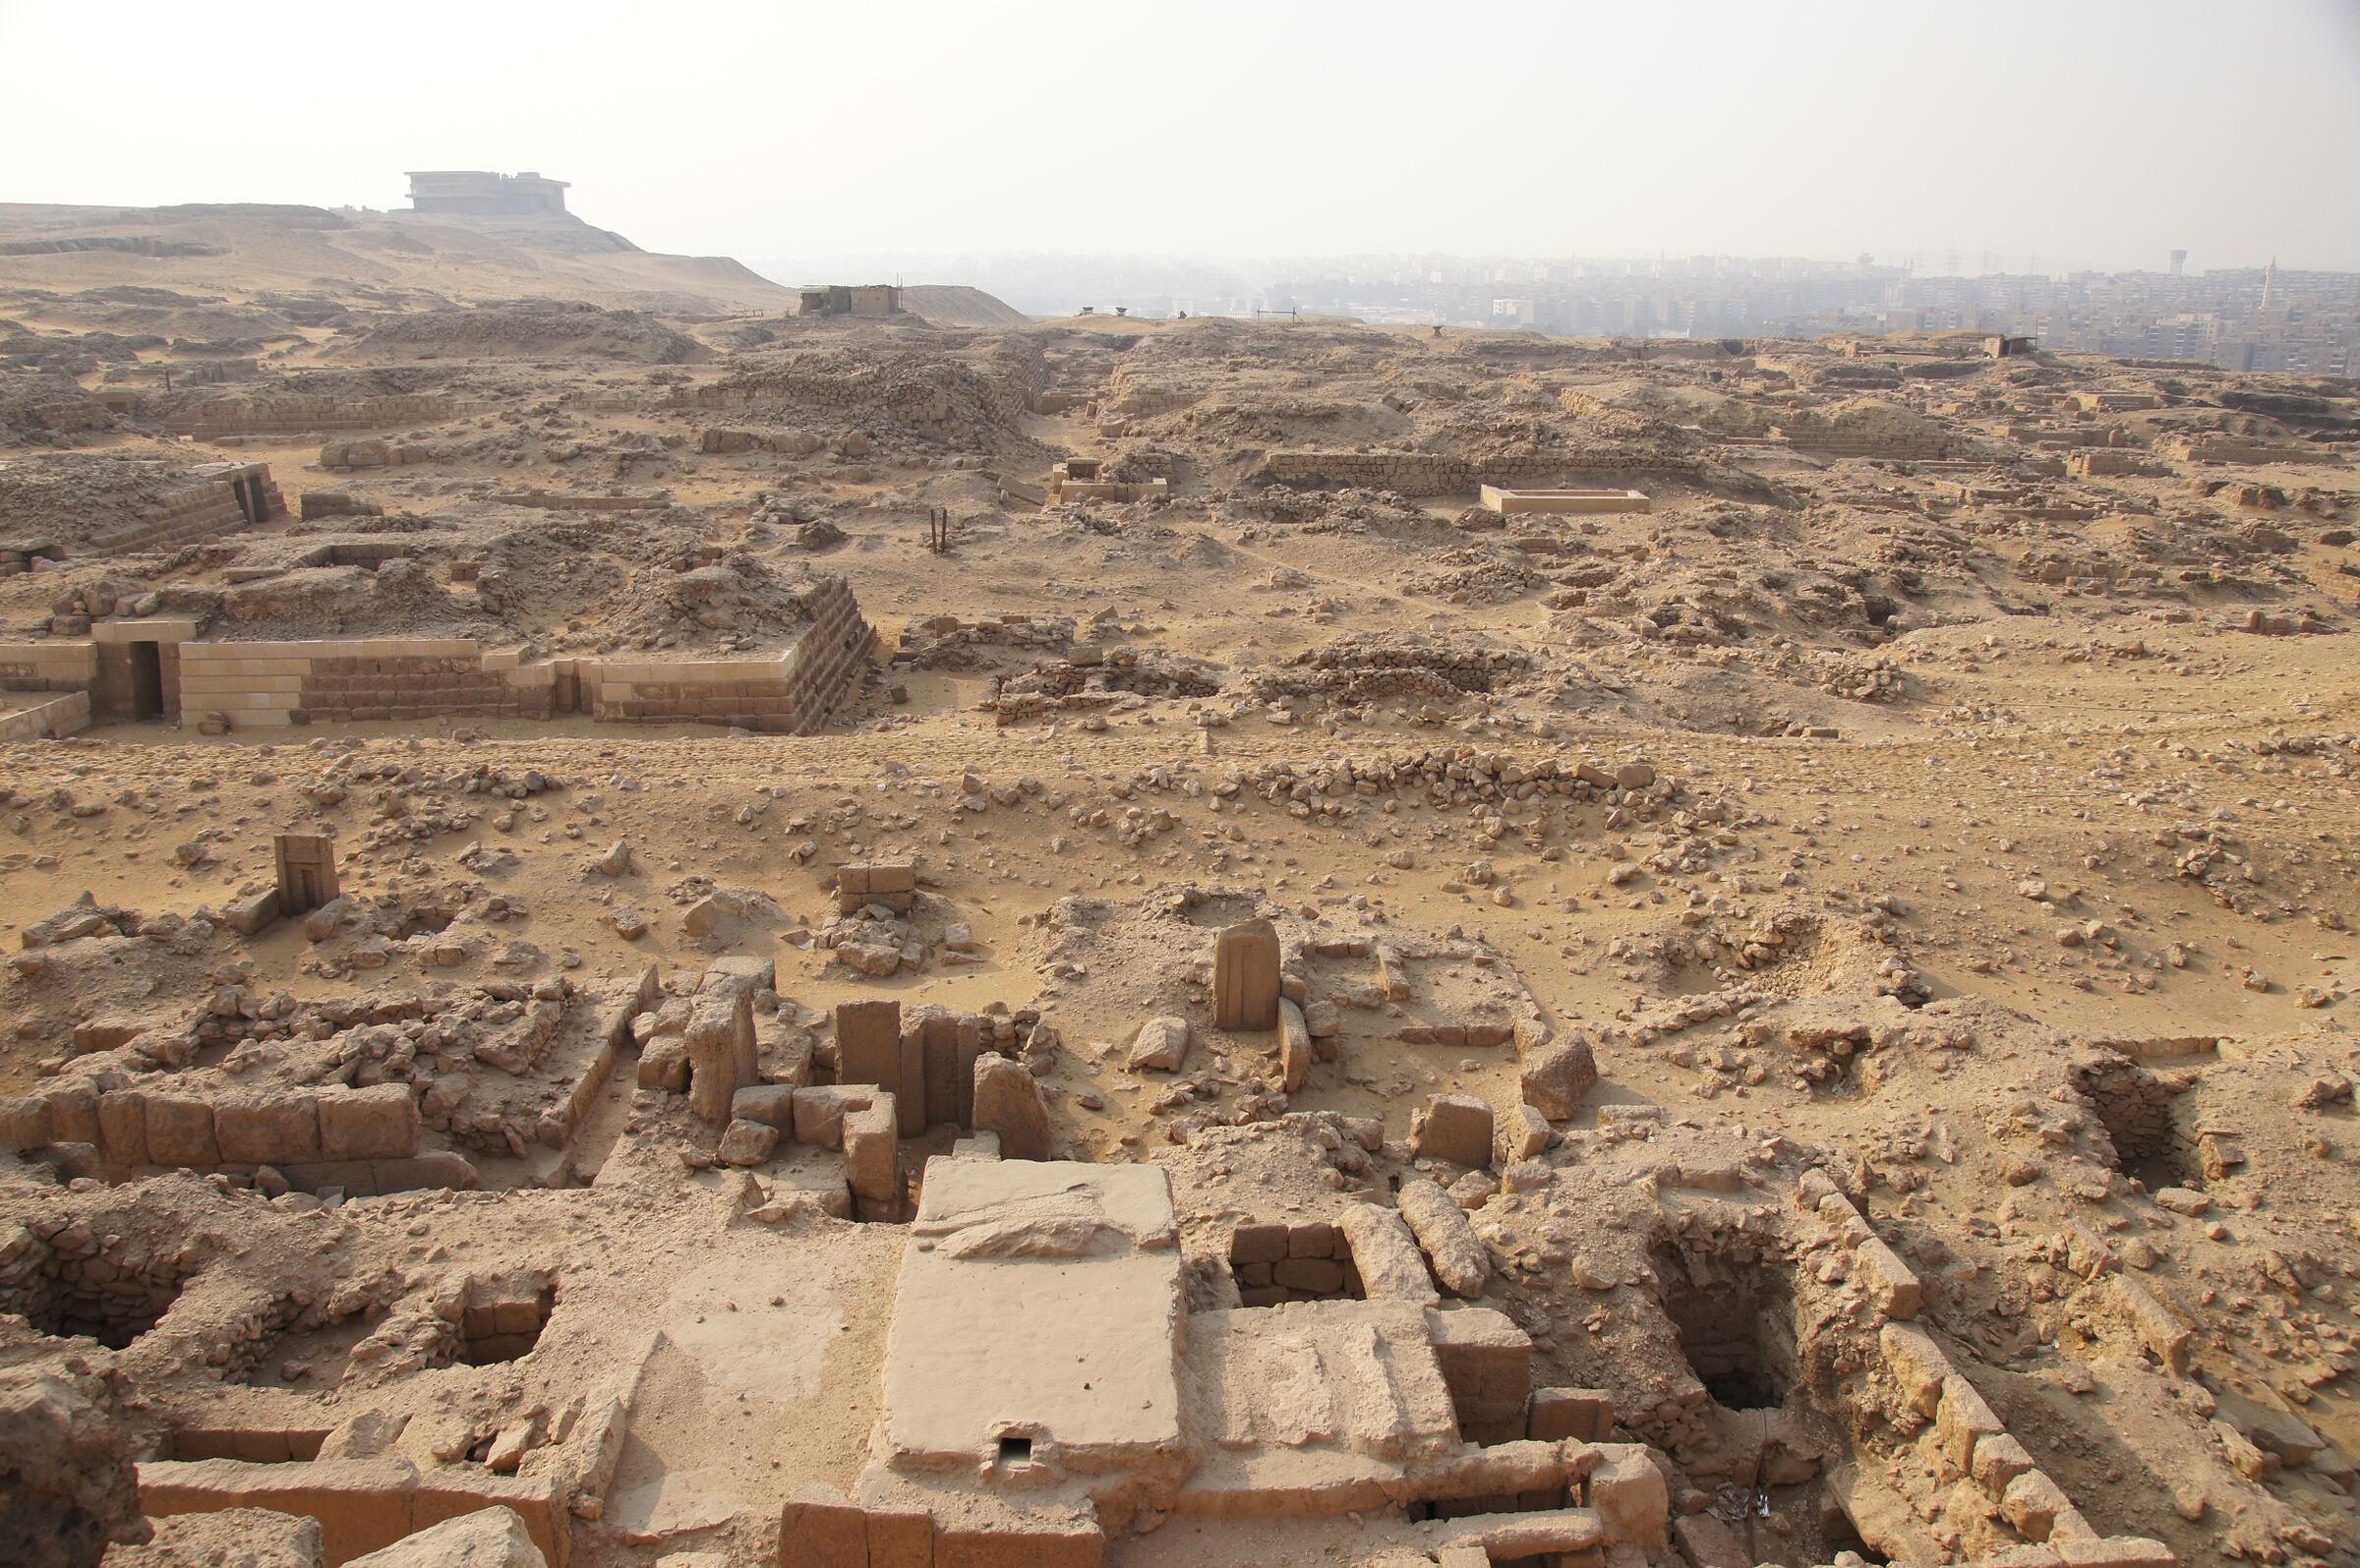 Western Cemetery: Site: Giza; View: G 1029, G 1047, G 1048, G 1031, G 1044, G 1045+1046, G 1065, G 1054, G 1042, G 1043, G 1036, G 1038, G 1020, G 1151, G 1152, G 1201